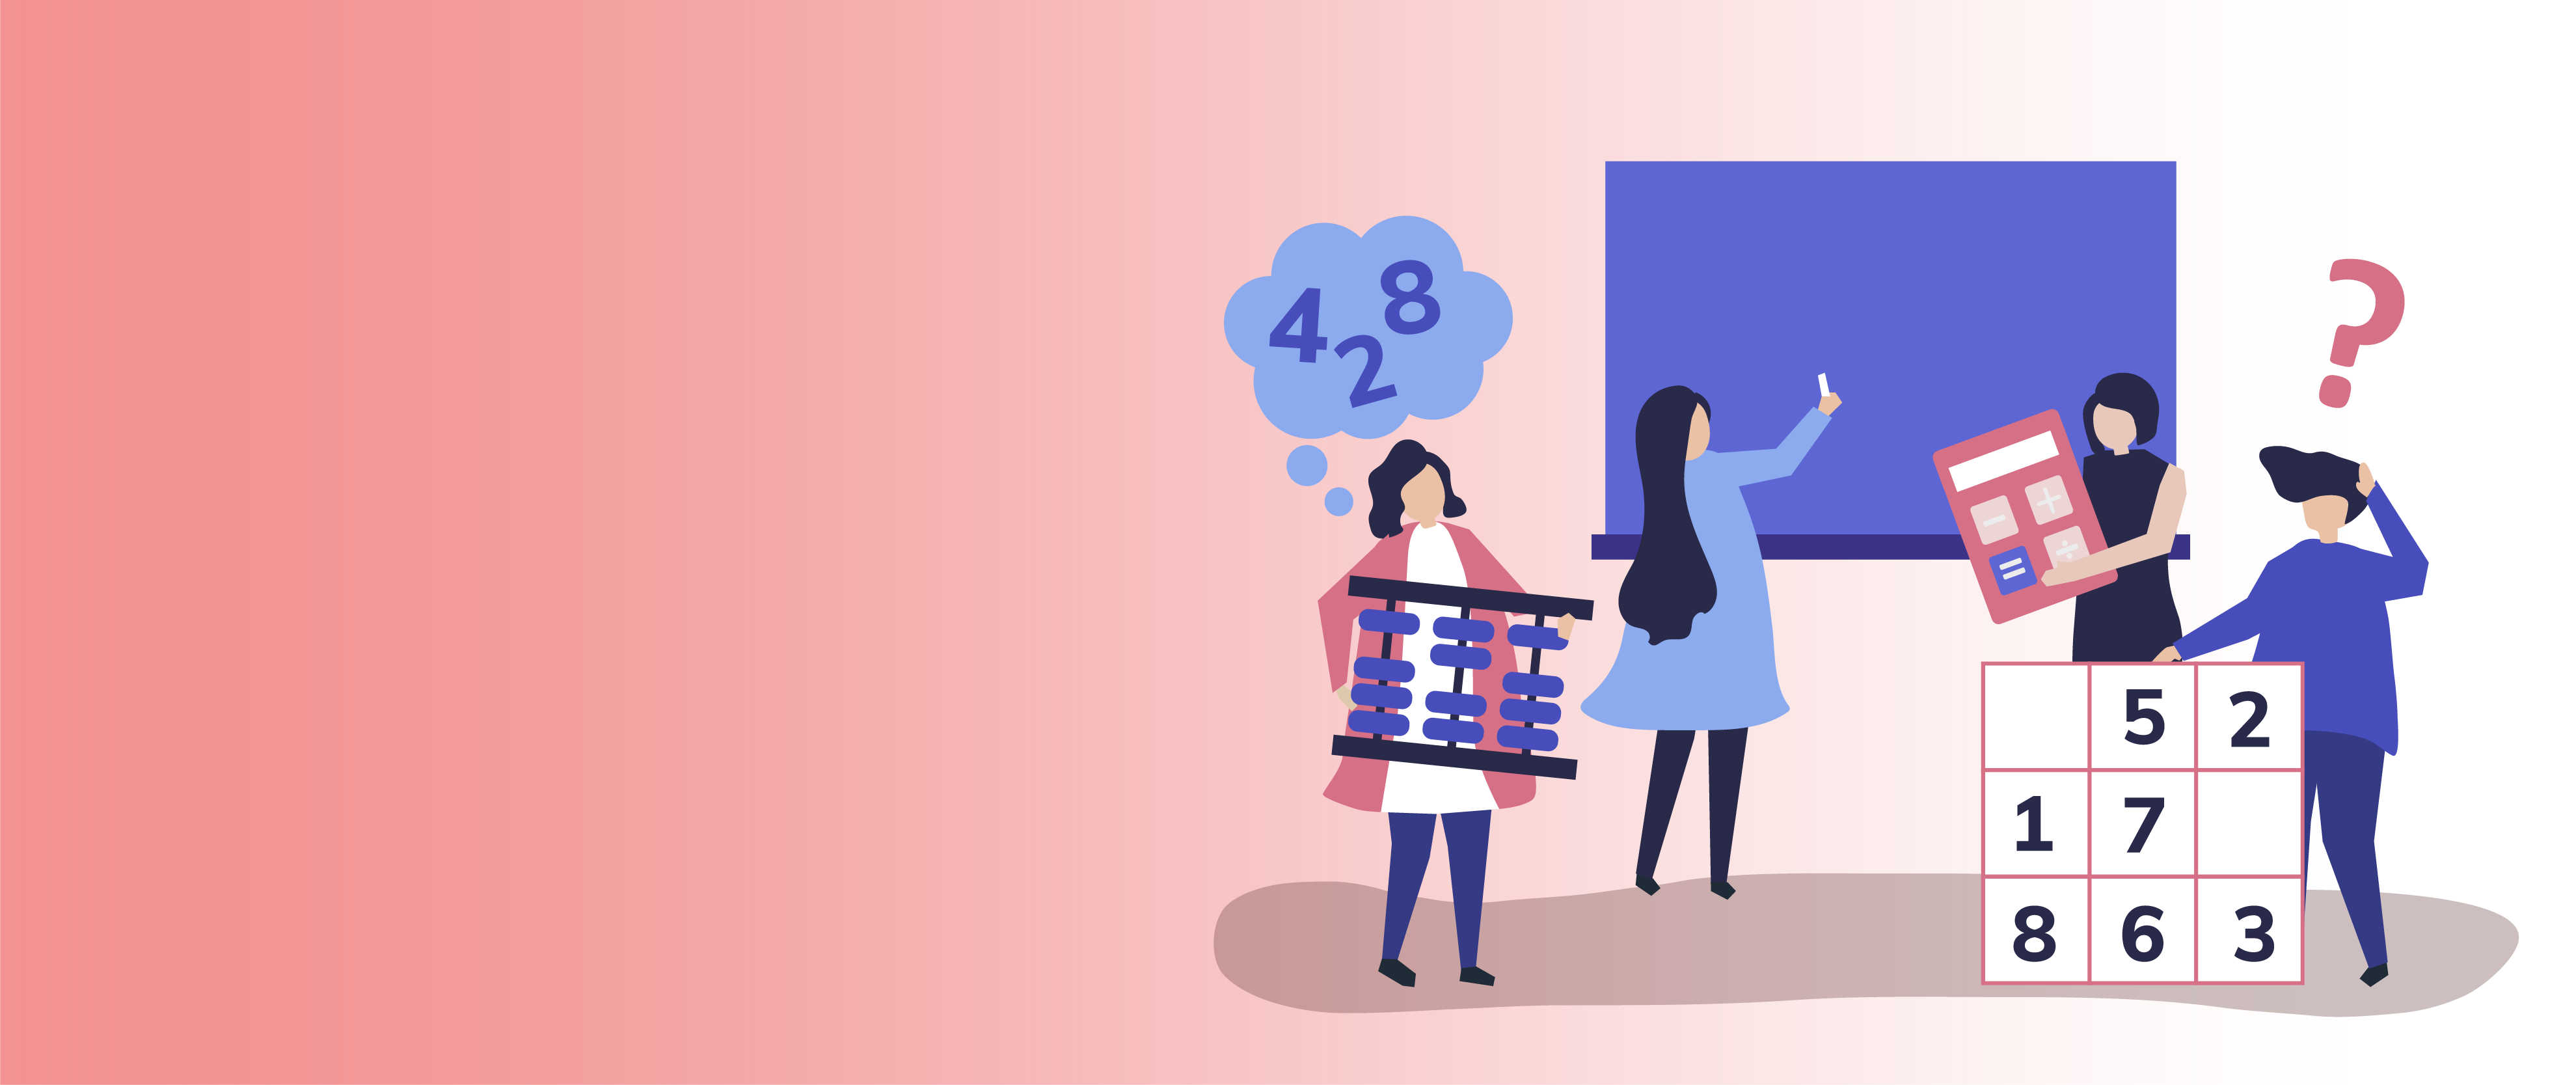 3 Key Marketing Metrics You Should Be Tracking